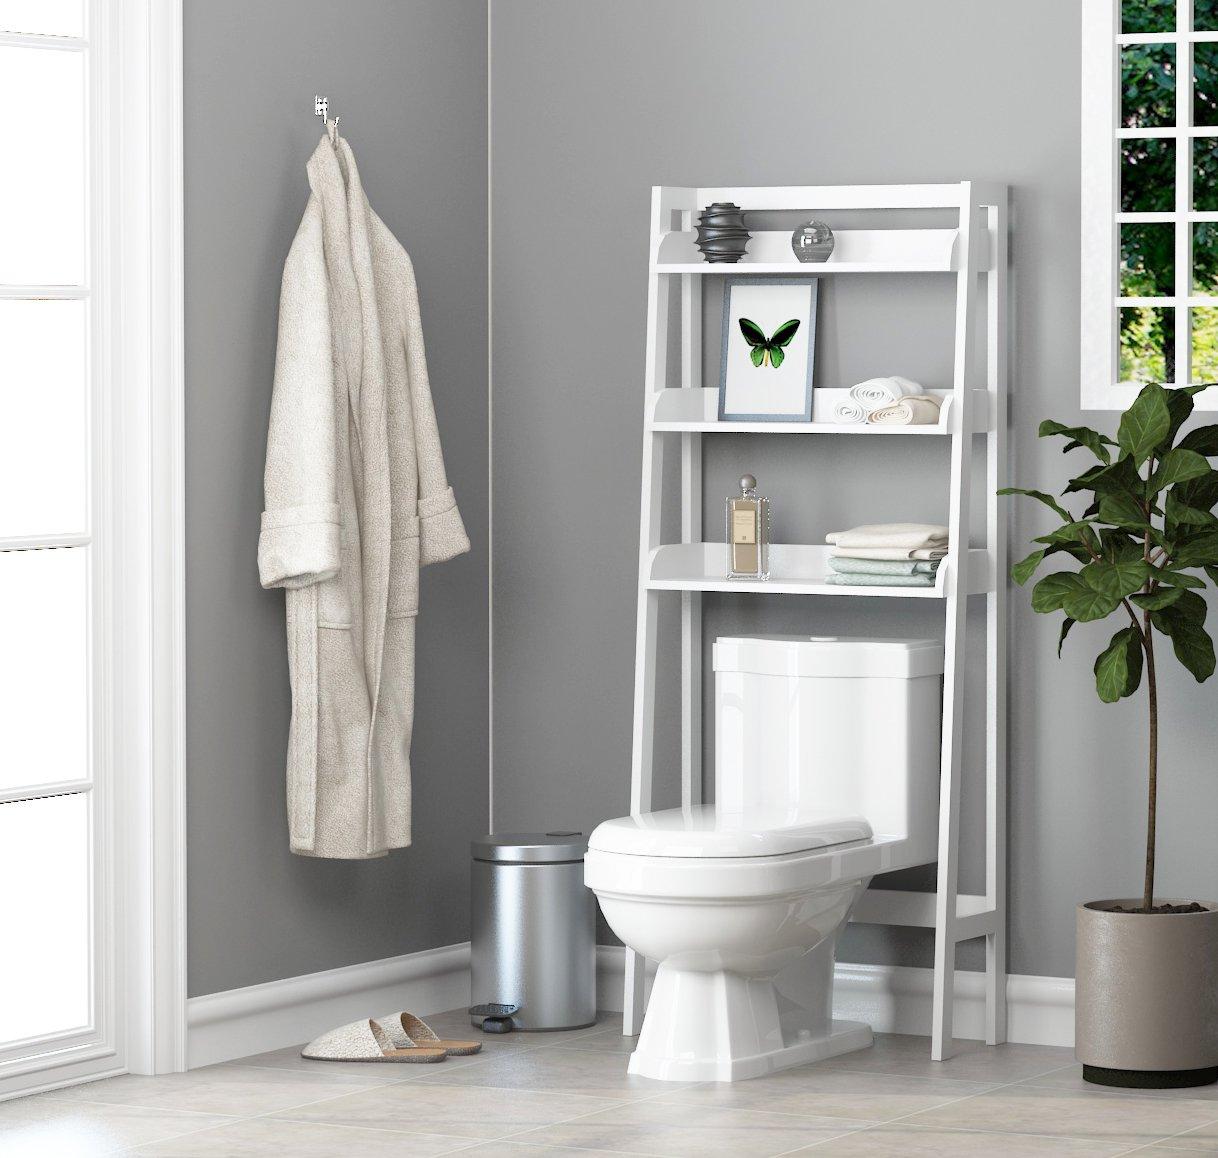 UTEX 3-Shelf Bathroom Organizer Over The Toilet, Bathroom Spacesaver, White Finish by UTEX